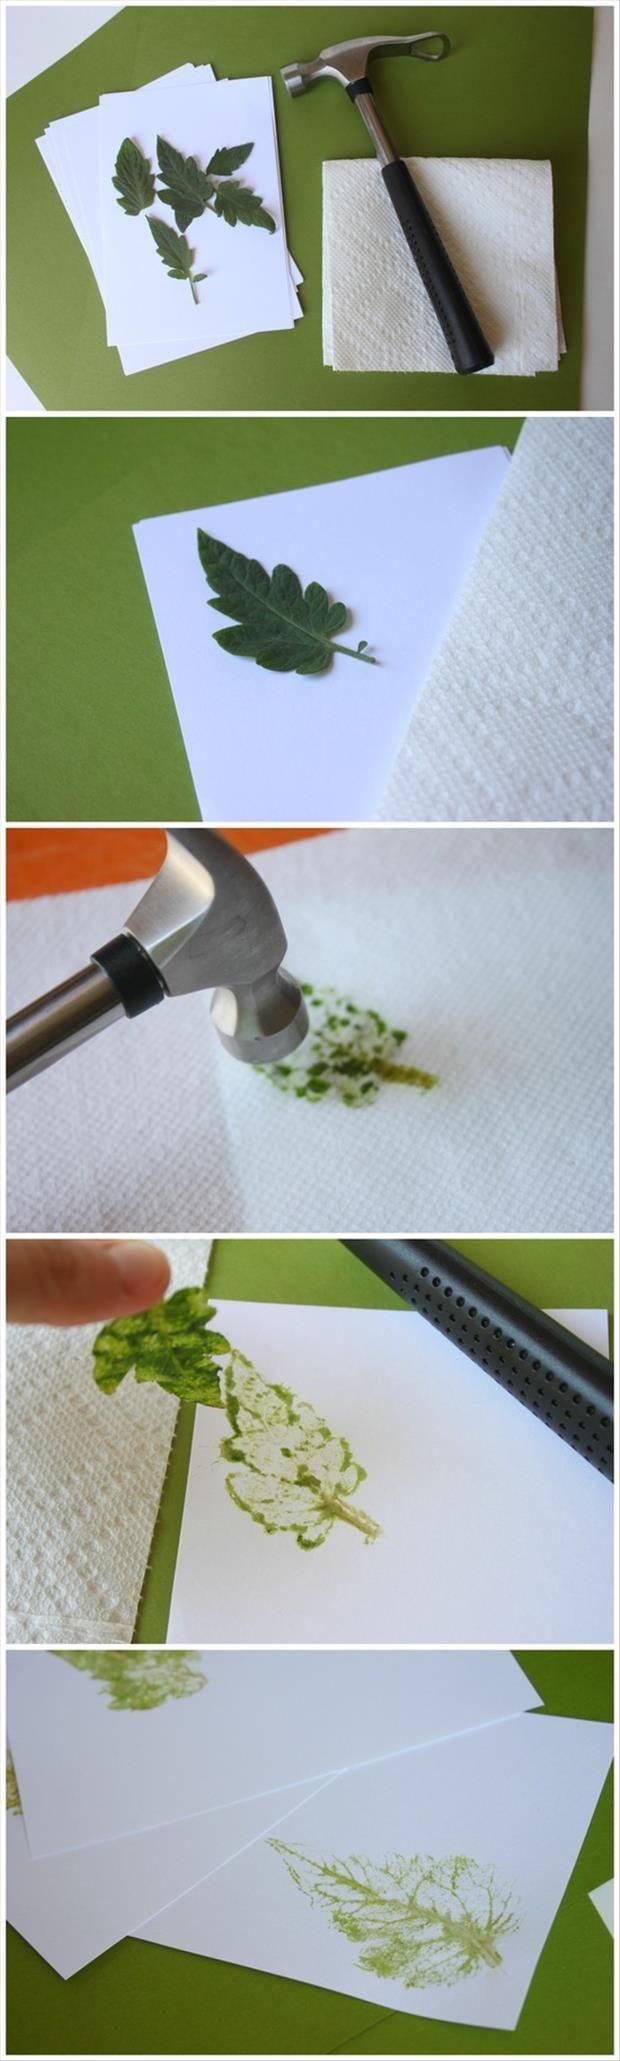 how to make a leaf print | Crafts for kids | Pinterest